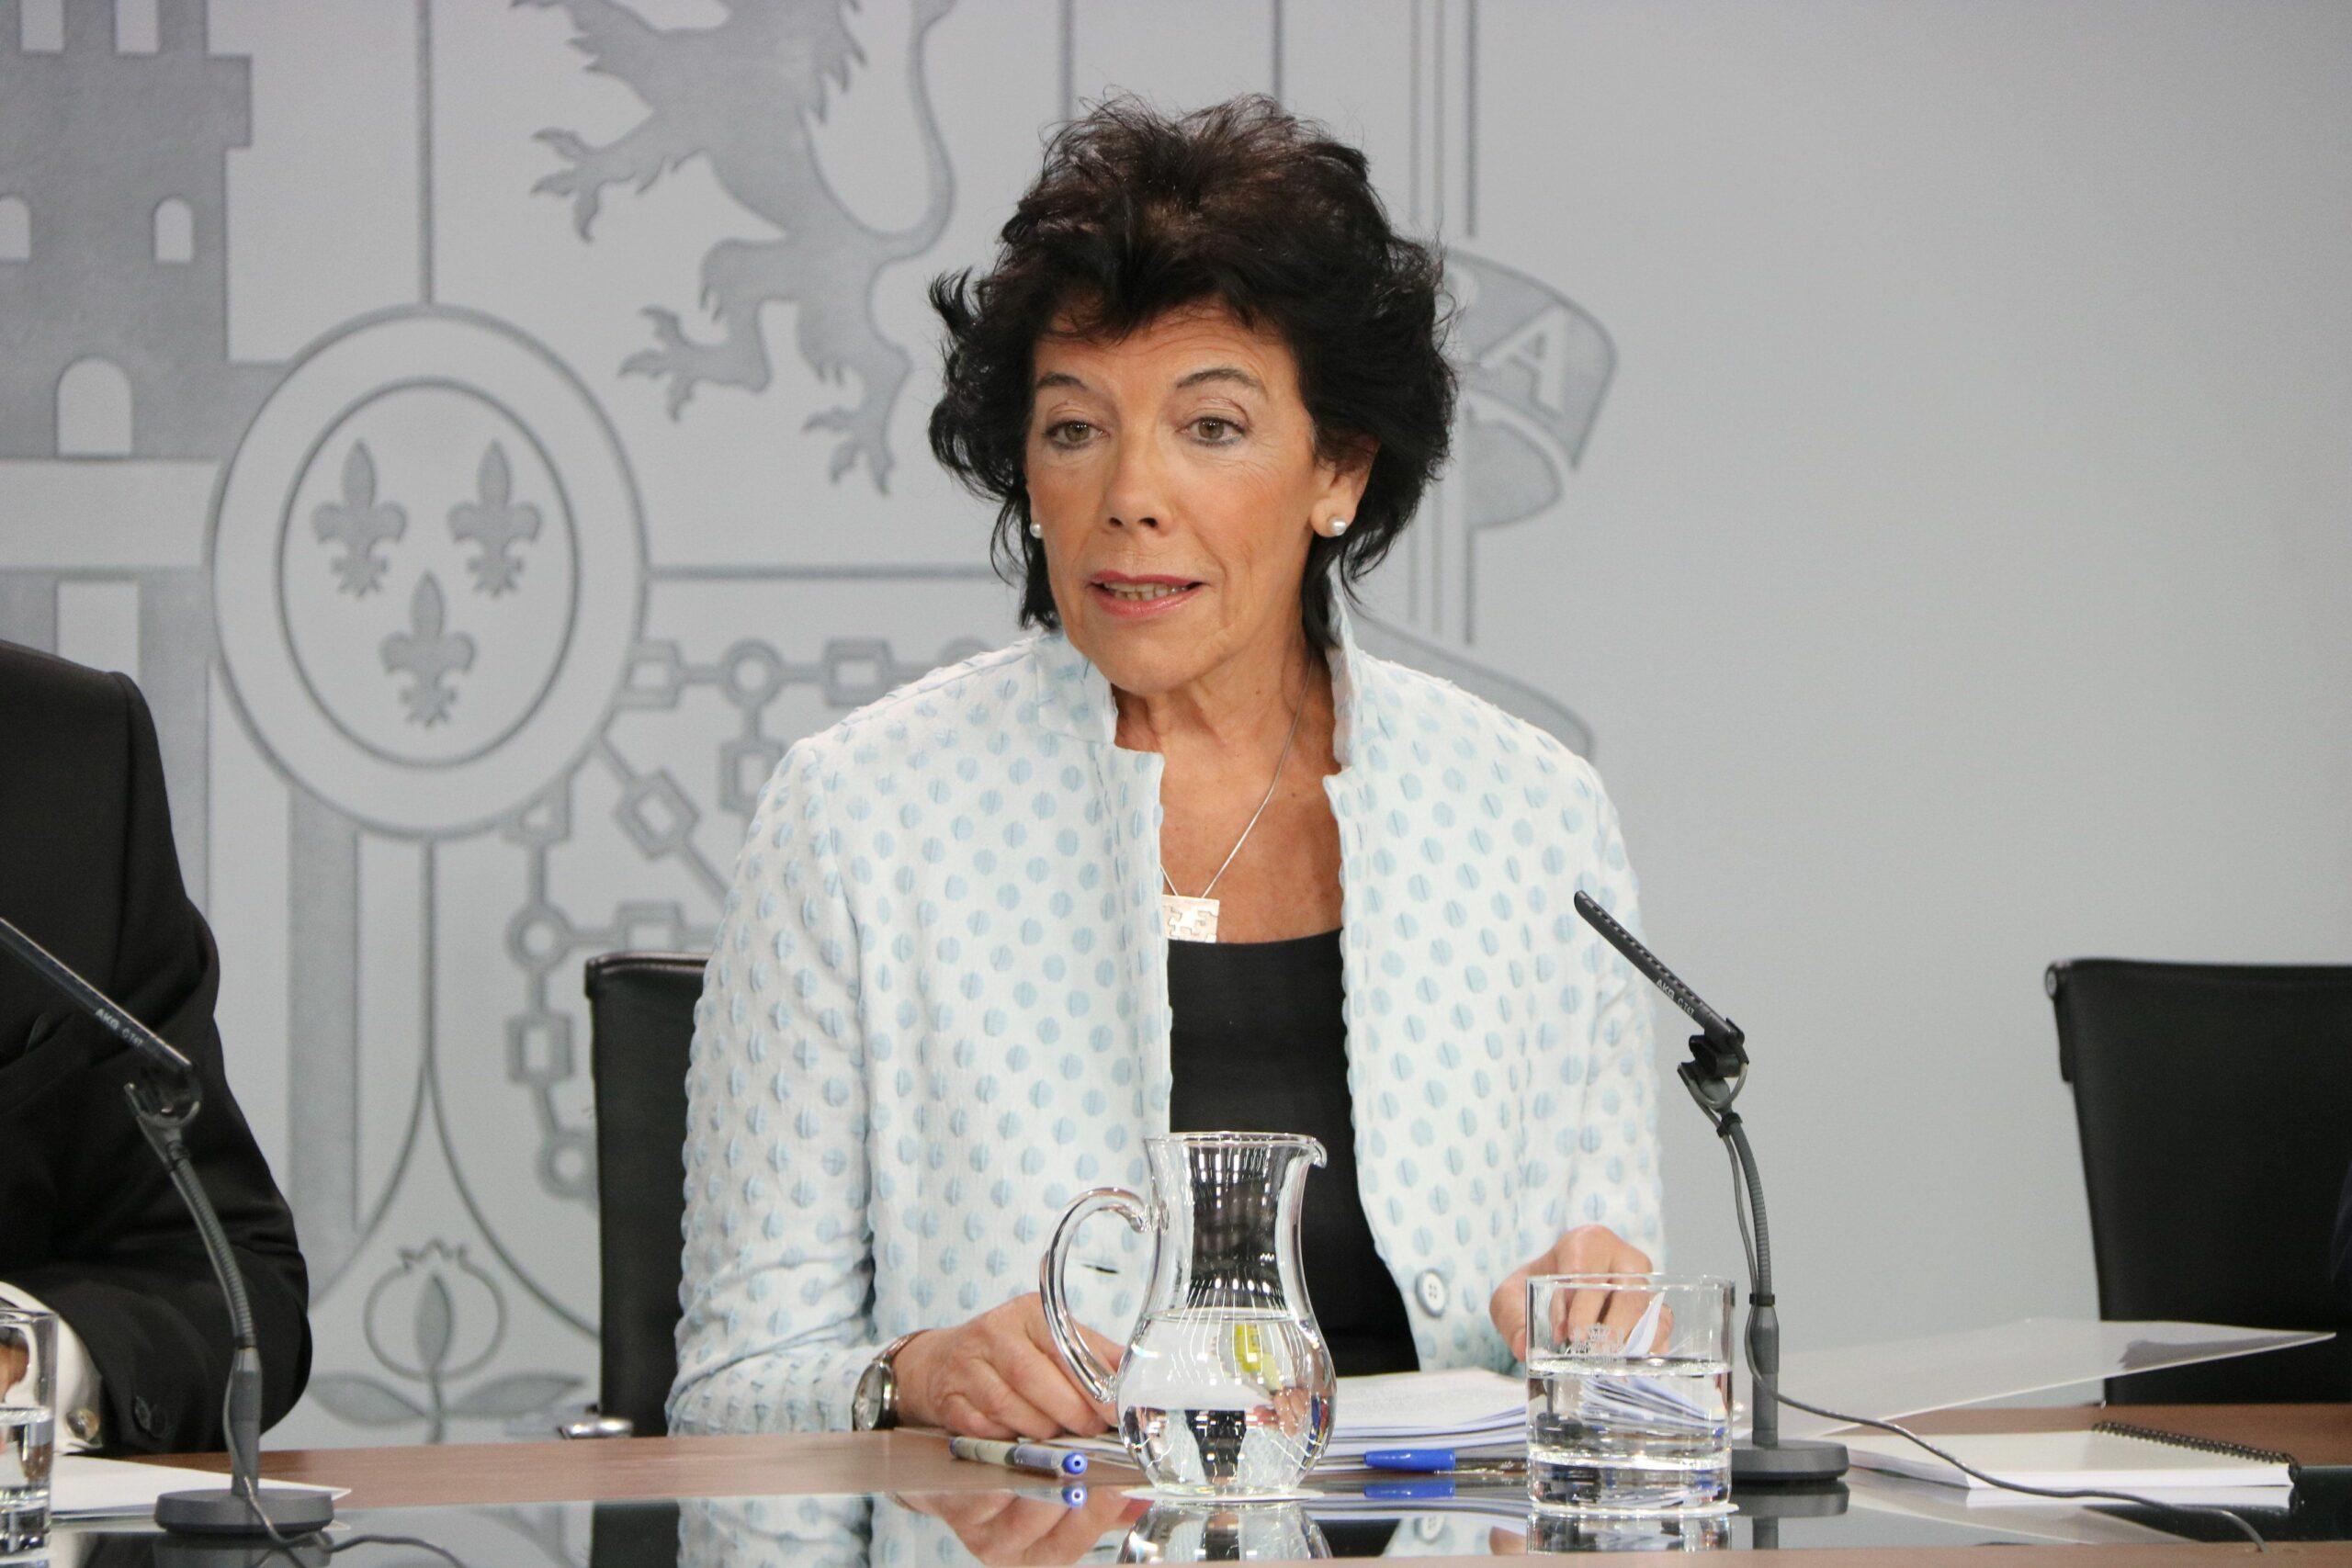 La portaveu del govern espanyol en funcions, Isabel Celaá